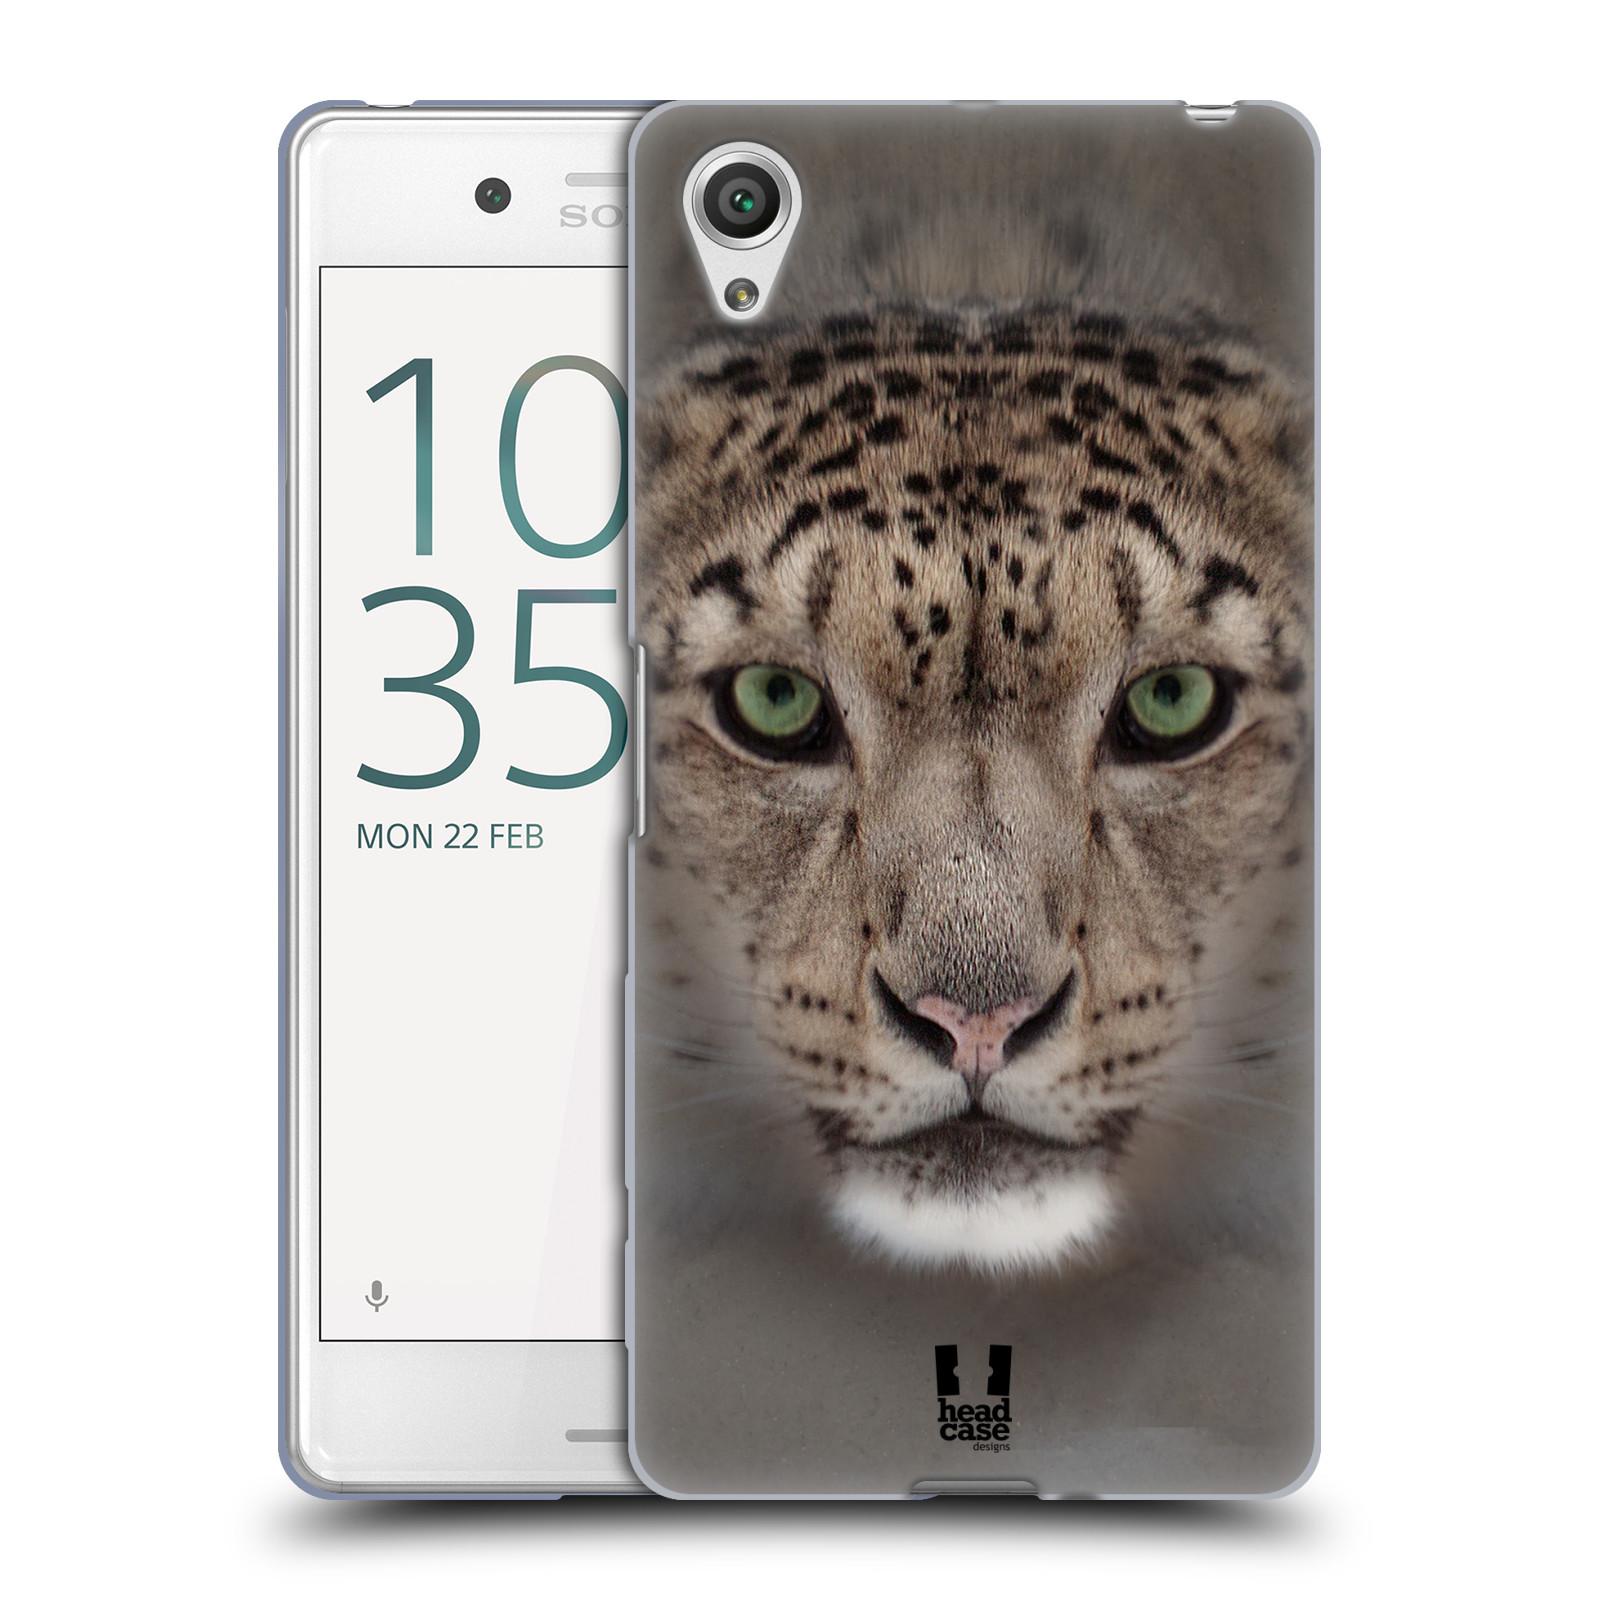 HEAD CASE silikonový obal na mobil Sony Xperia X PERFORMANCE (F8131, F8132) vzor Zvířecí tváře 2 sněžný leopard